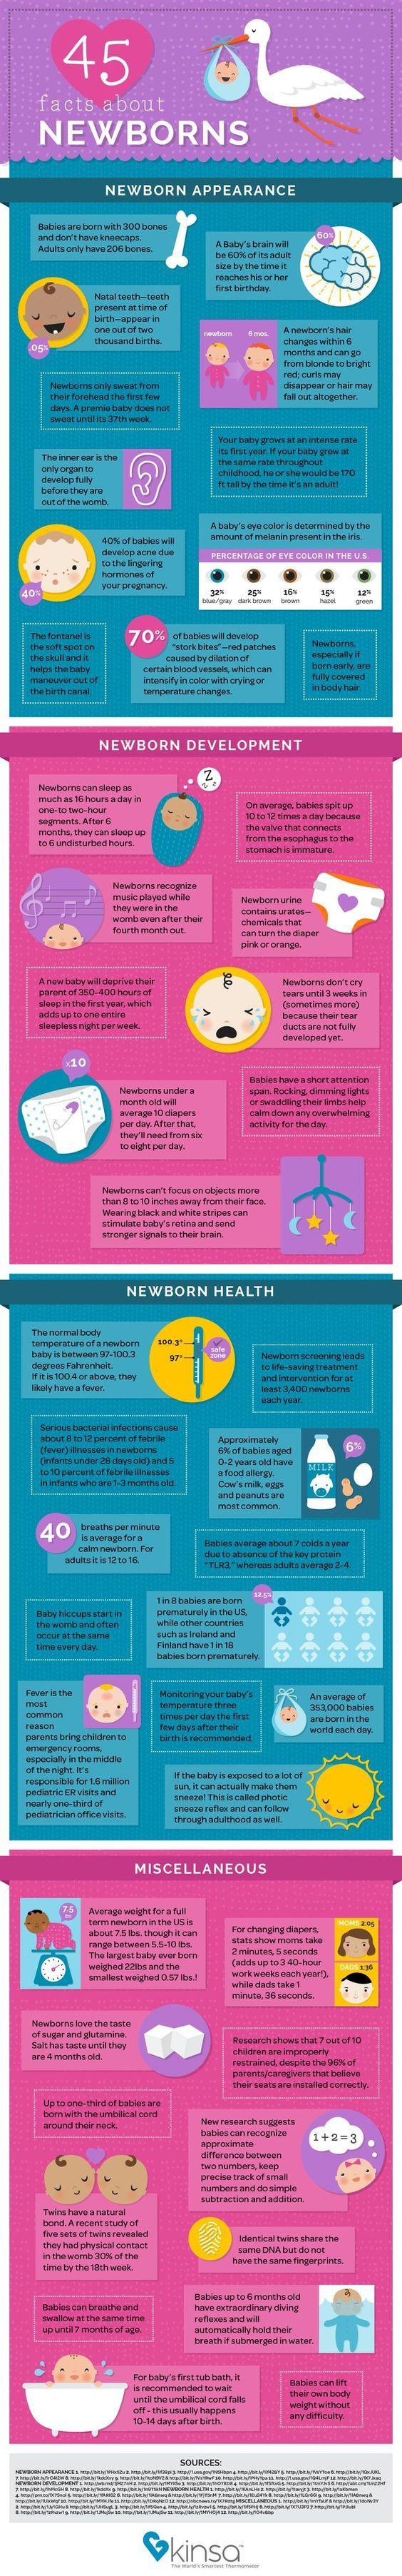 45 Amazing Facts About Newborns